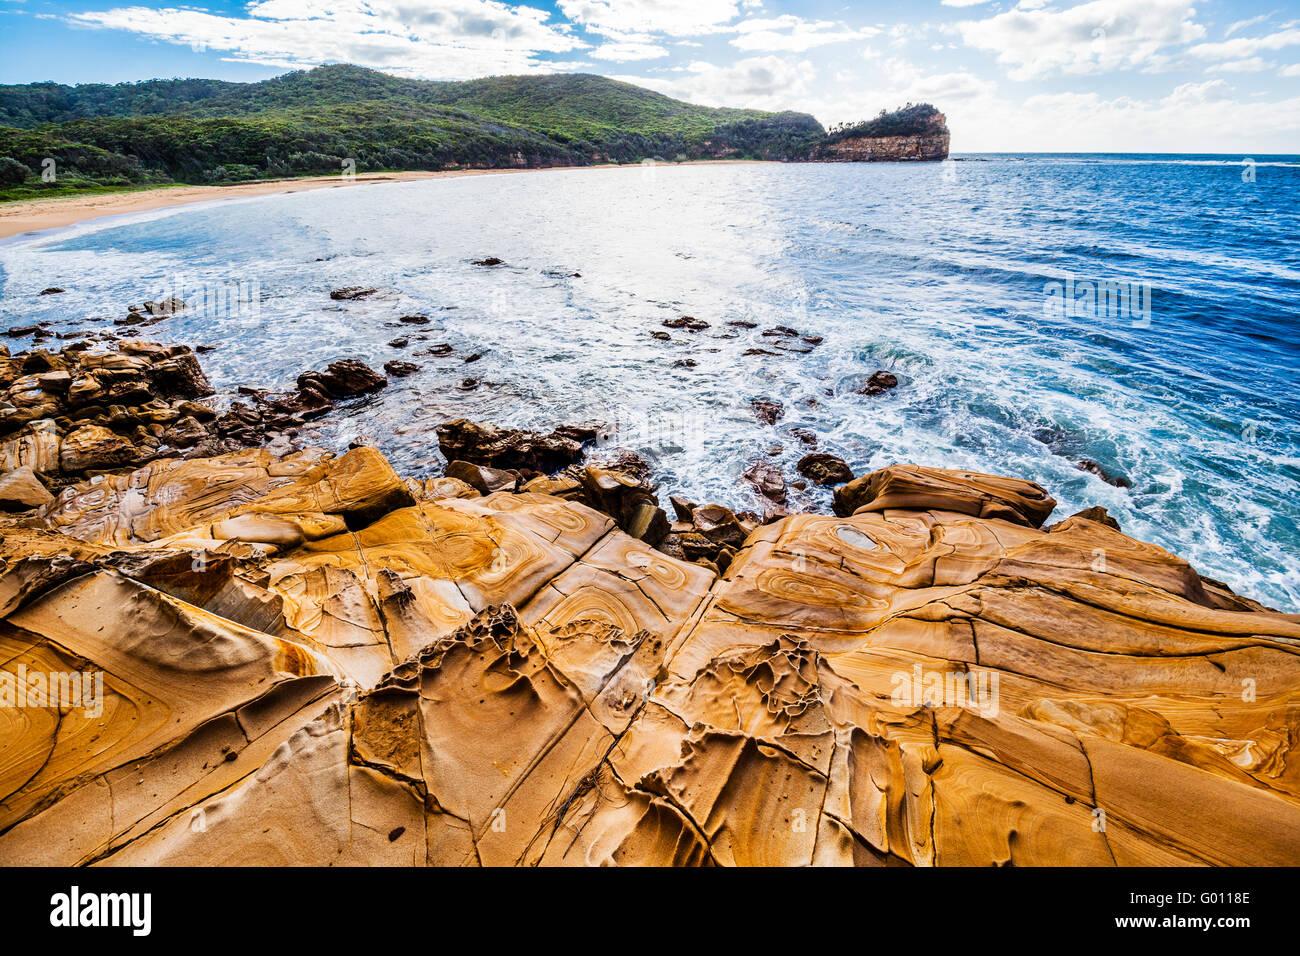 Australia, New South Wales, Central Coast, Bouddi National Park, rock platform at Maitland Bay - Stock Image